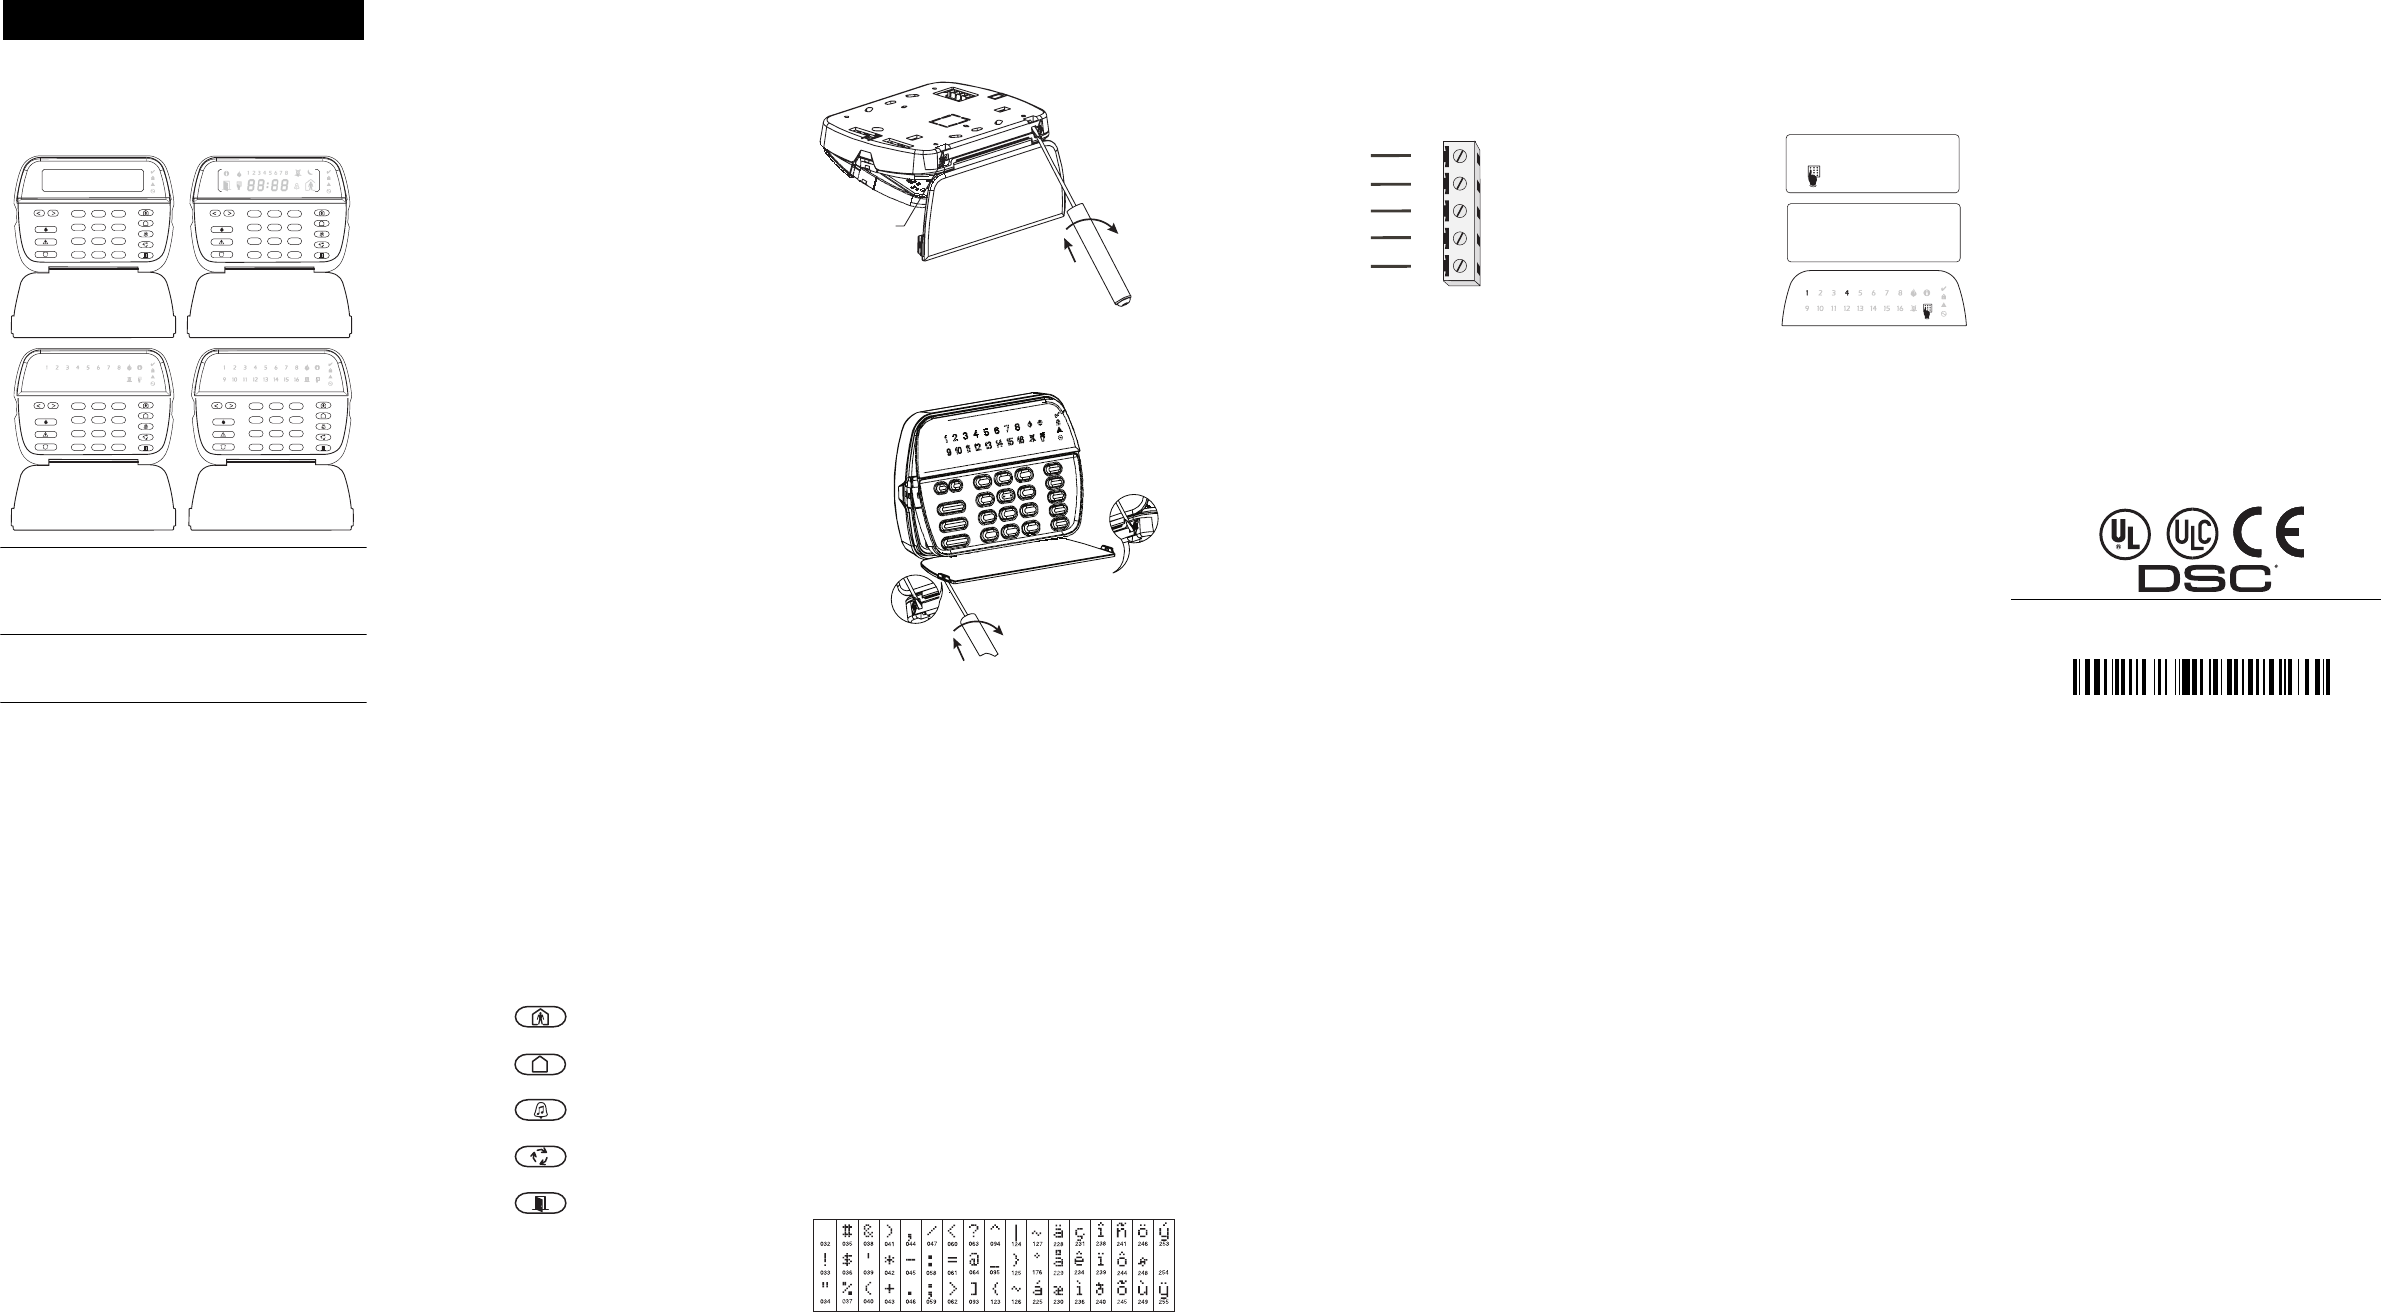 dsc keypad pk5501 user manual